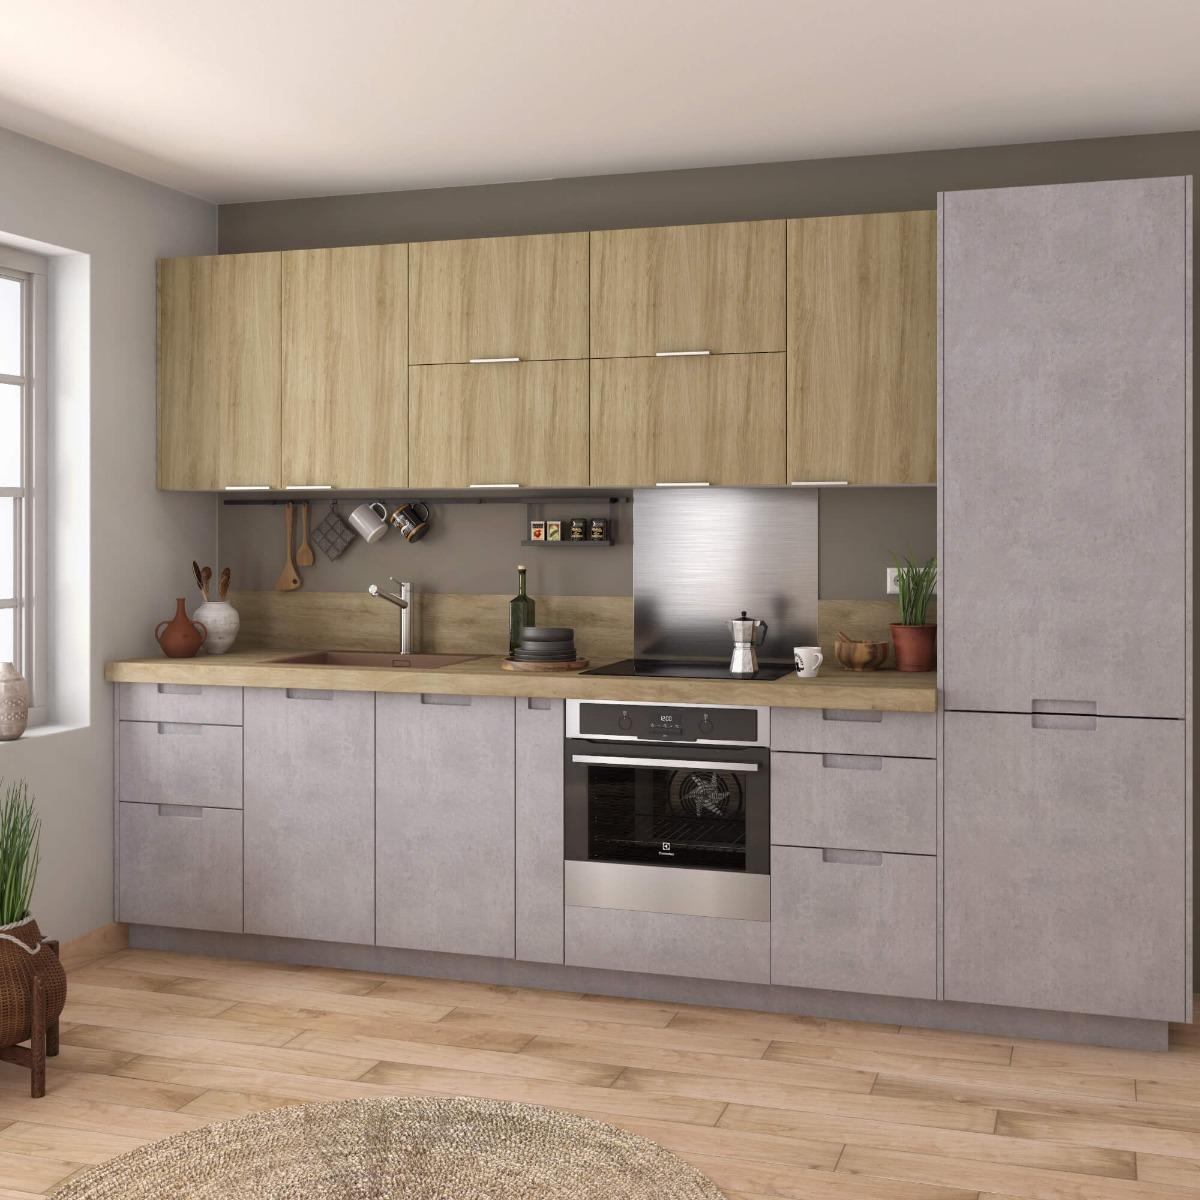 Delinia Berlin Designer Kitchen Mobi - Example 3